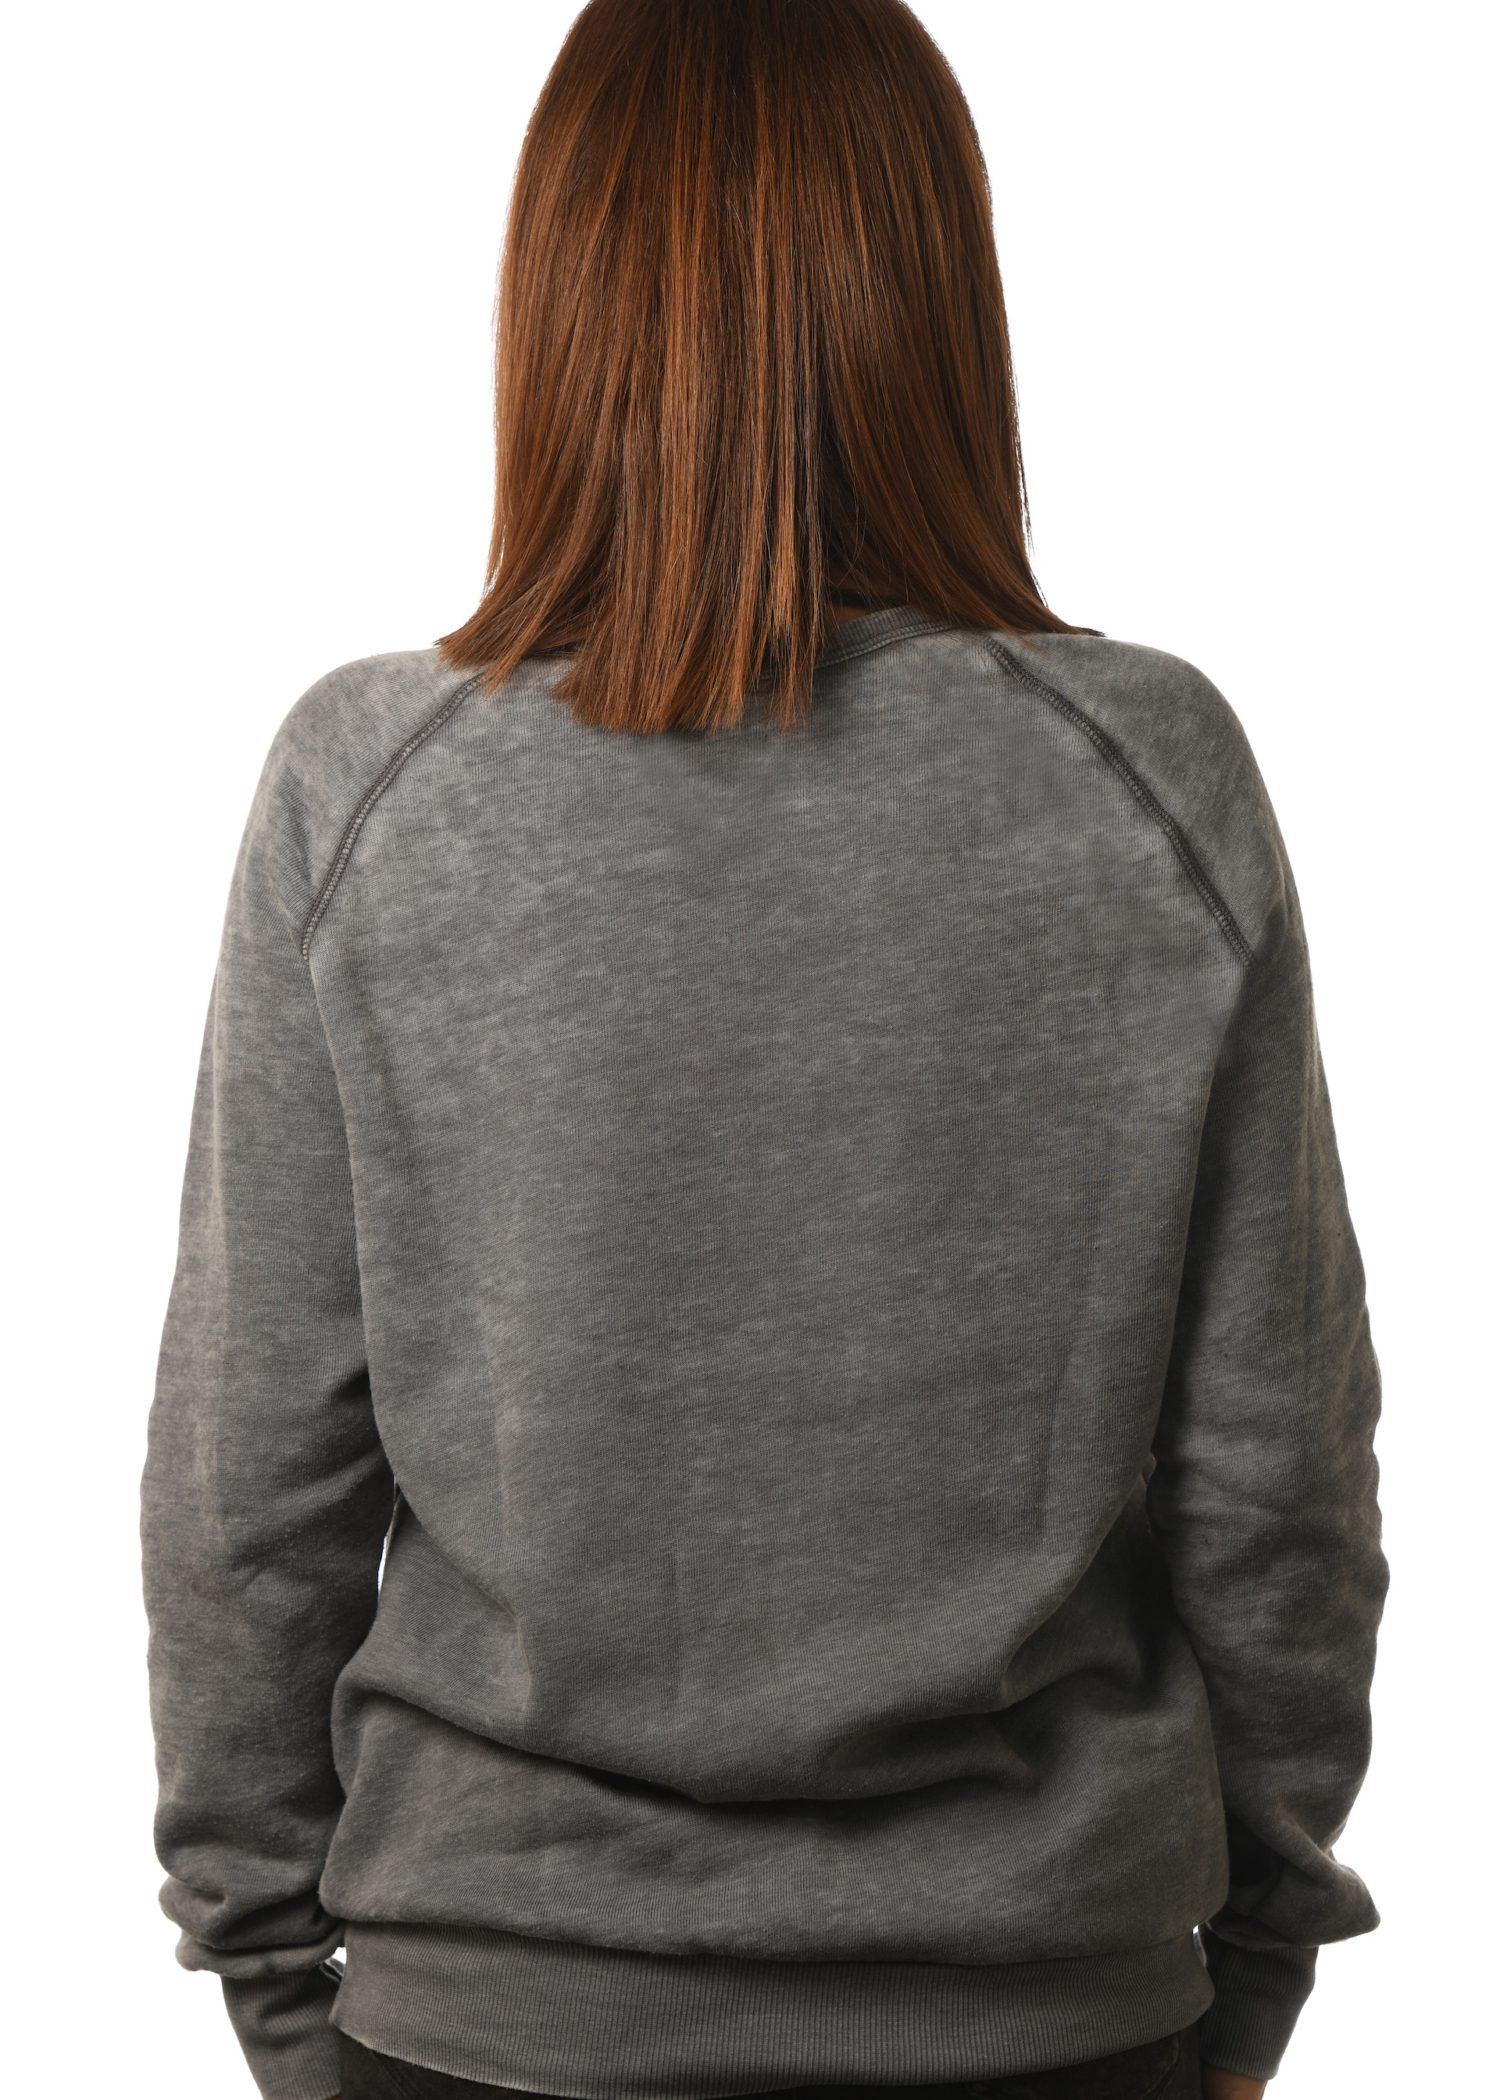 GG 798-B Unisex 'Wornwash' Old School Fleece Raglan Back 1